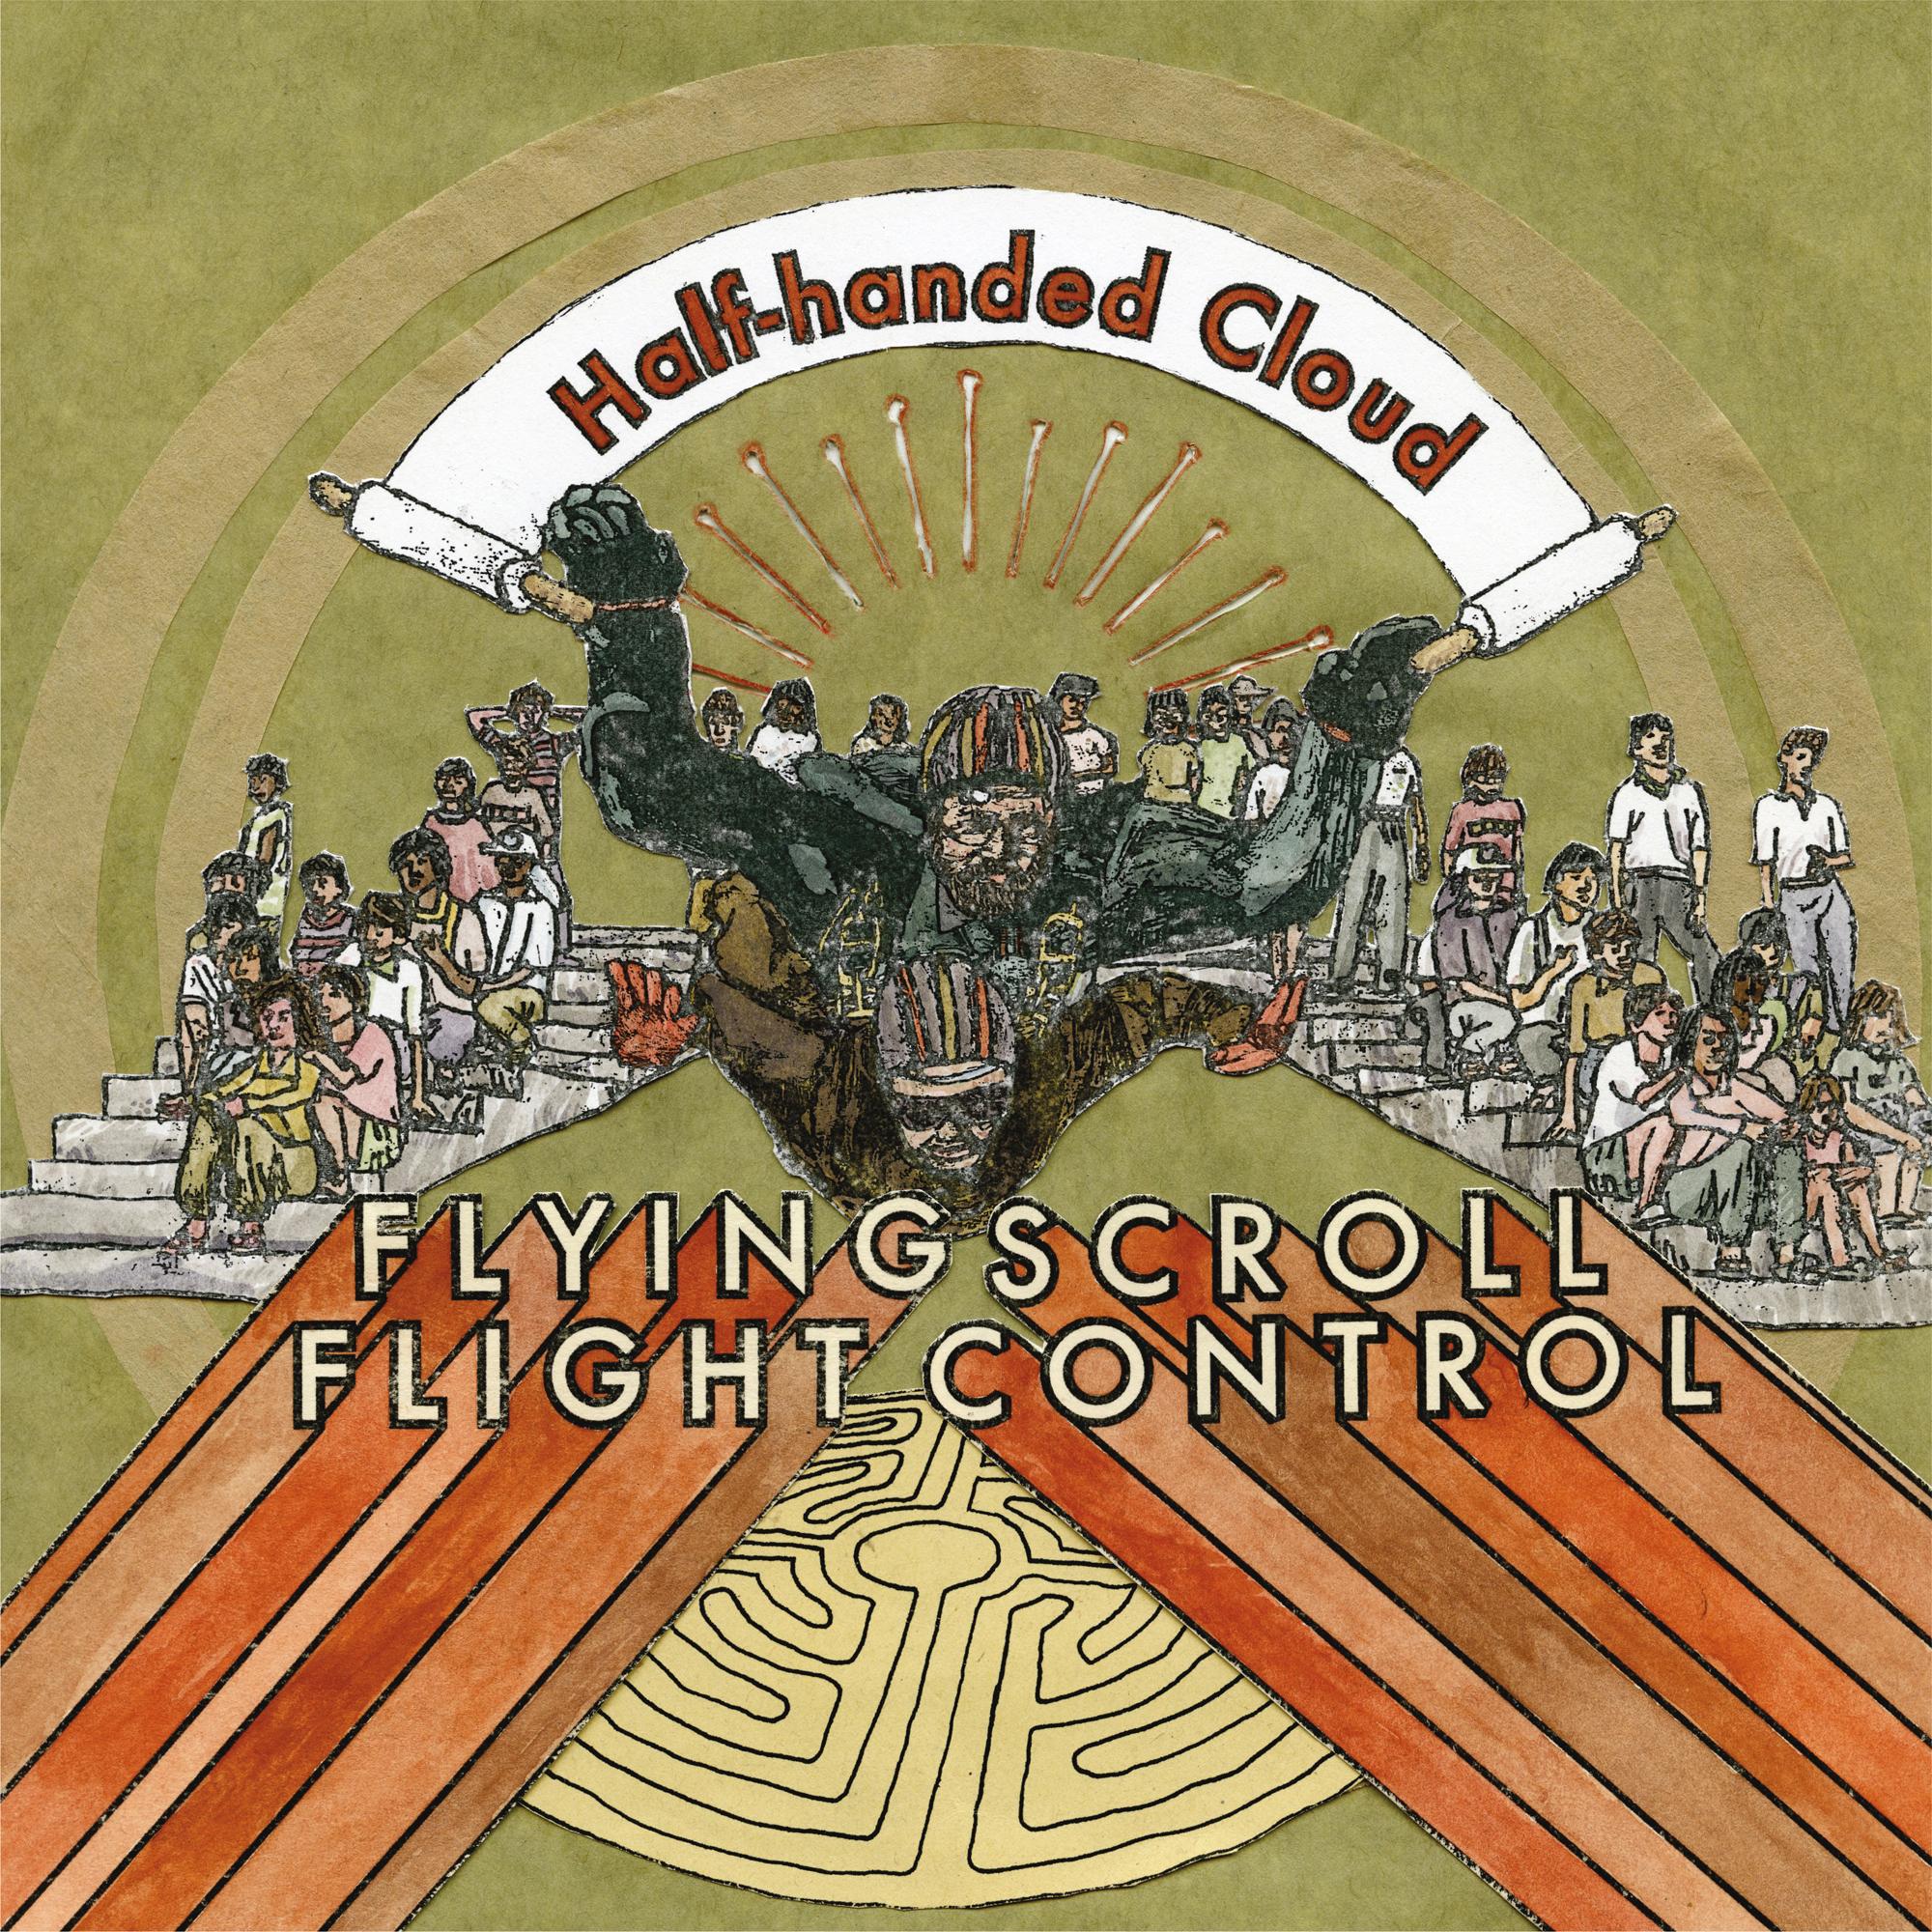 Flying Scroll Flight Control (album cover)